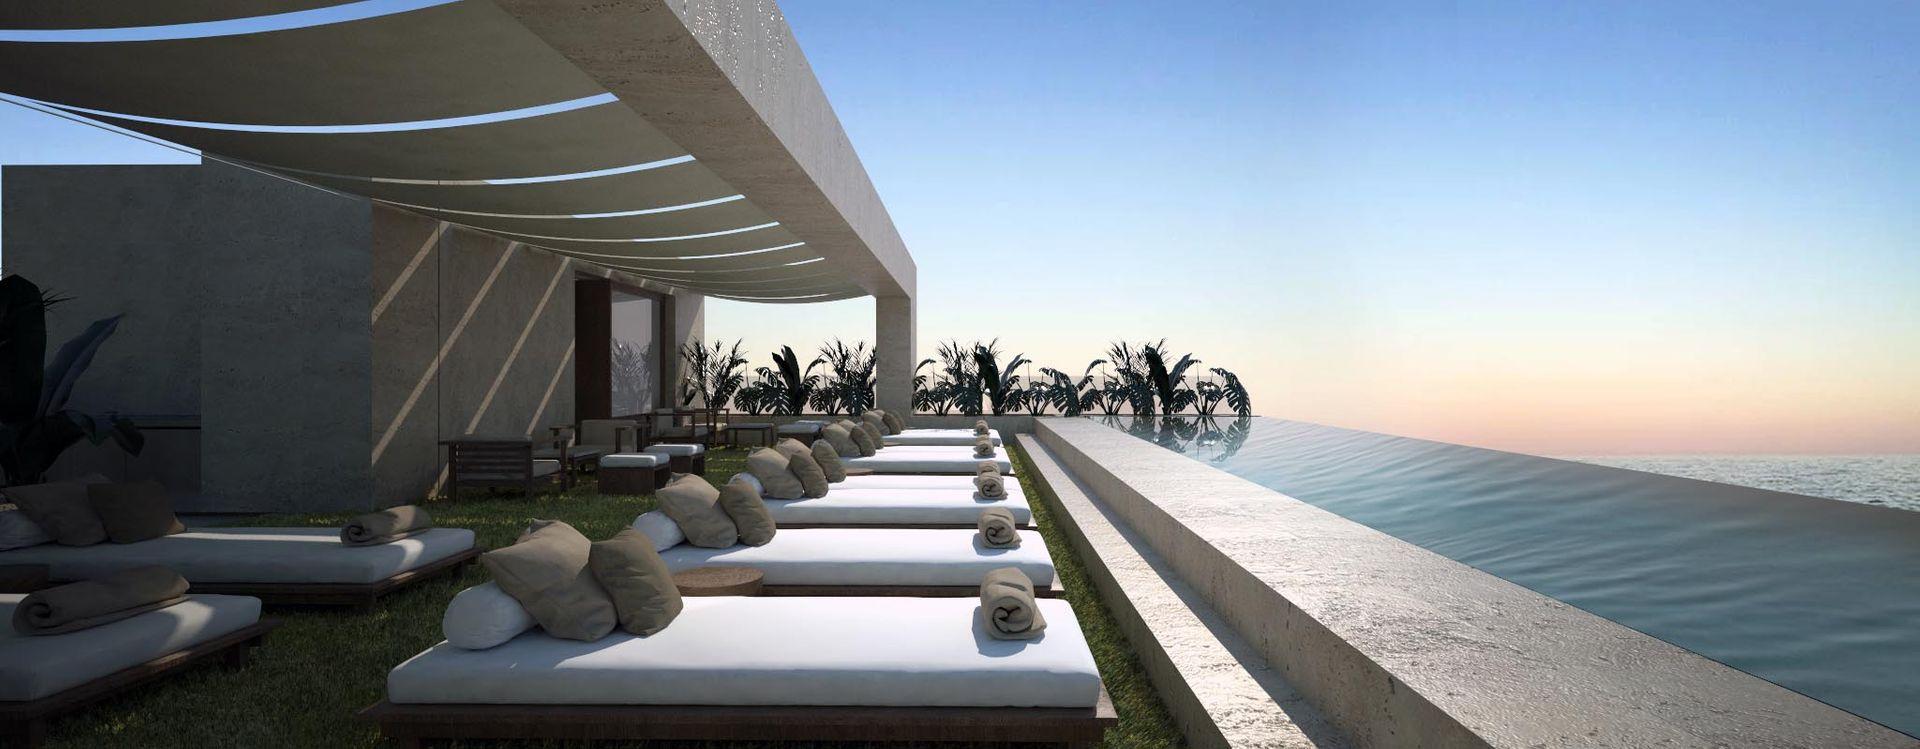 4* SanSal Boutique Hotel - Χανιά, Κρήτη ✦ -25% ✦ 4 Ημέρες (3 Διανυκτερεύσεις) ✦ 2 άτομα ✦ Πρωινό ✦ 01/09/2020 έως 30/09/2020 ✦ Free WiFi!